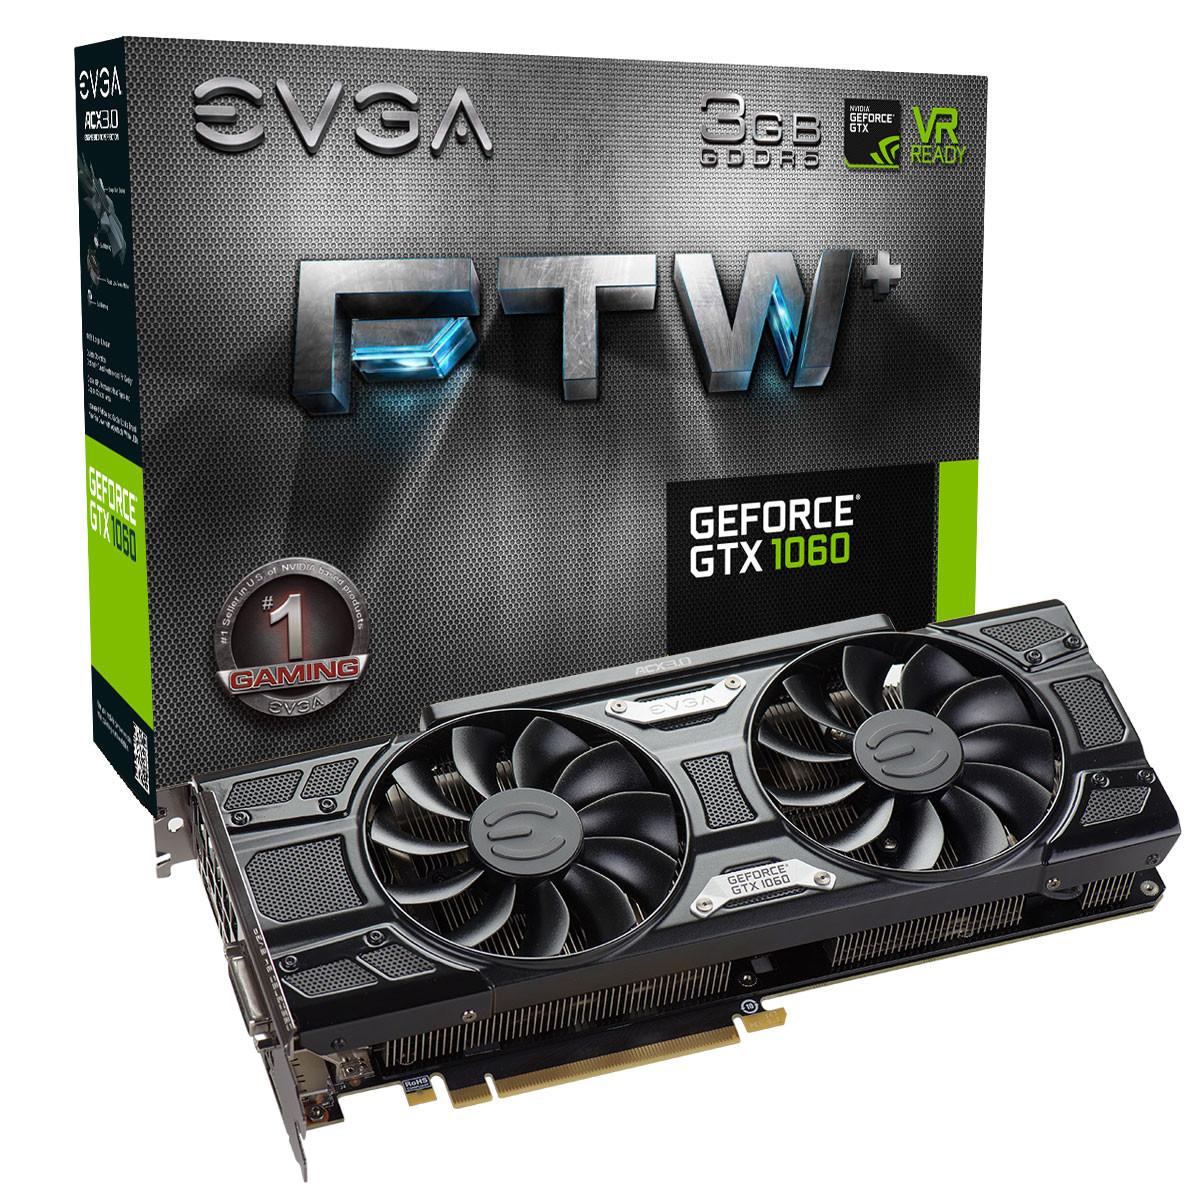 EVGA announces GeForce GTX 1060 3GB FTW, SSC and SC